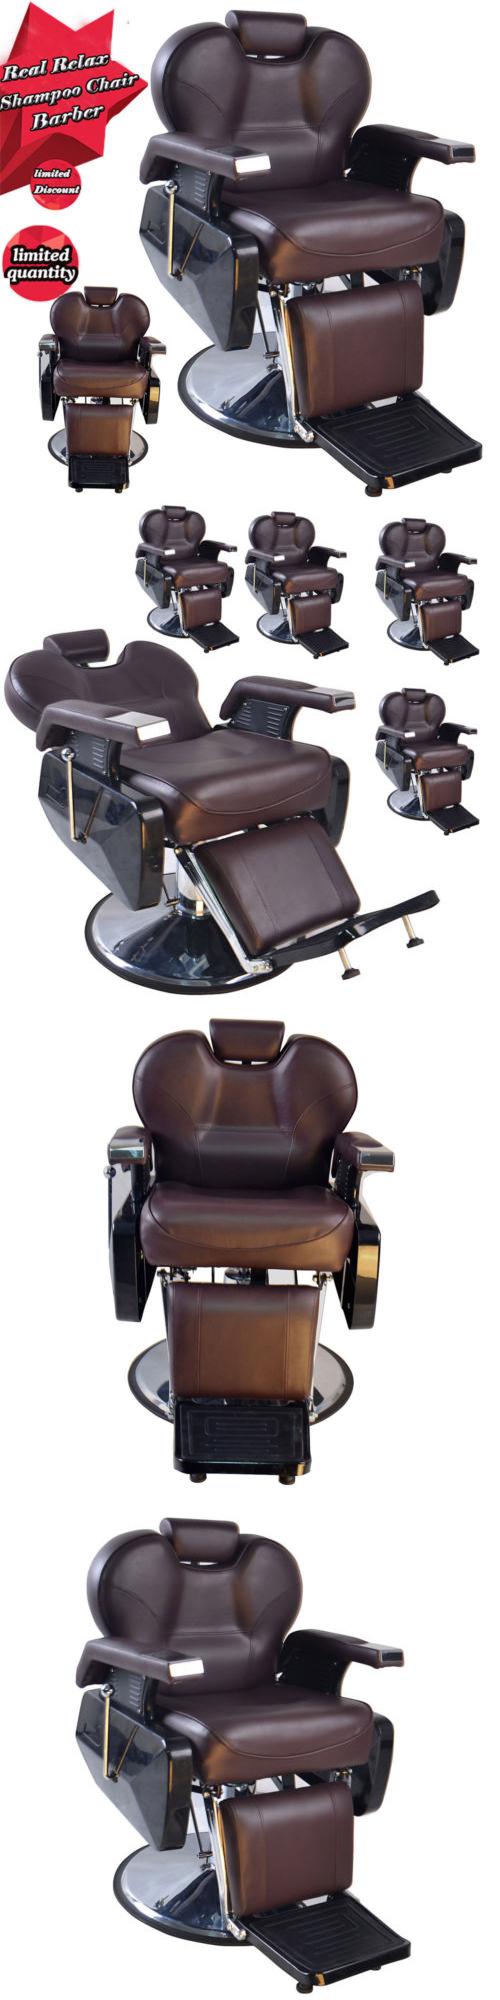 Elegant Stylist Stations And Furniture: Hot Barberpub Hydraulic Recline Salon  Beauty Spa Styling Barber Chair Equipment Design Ideas